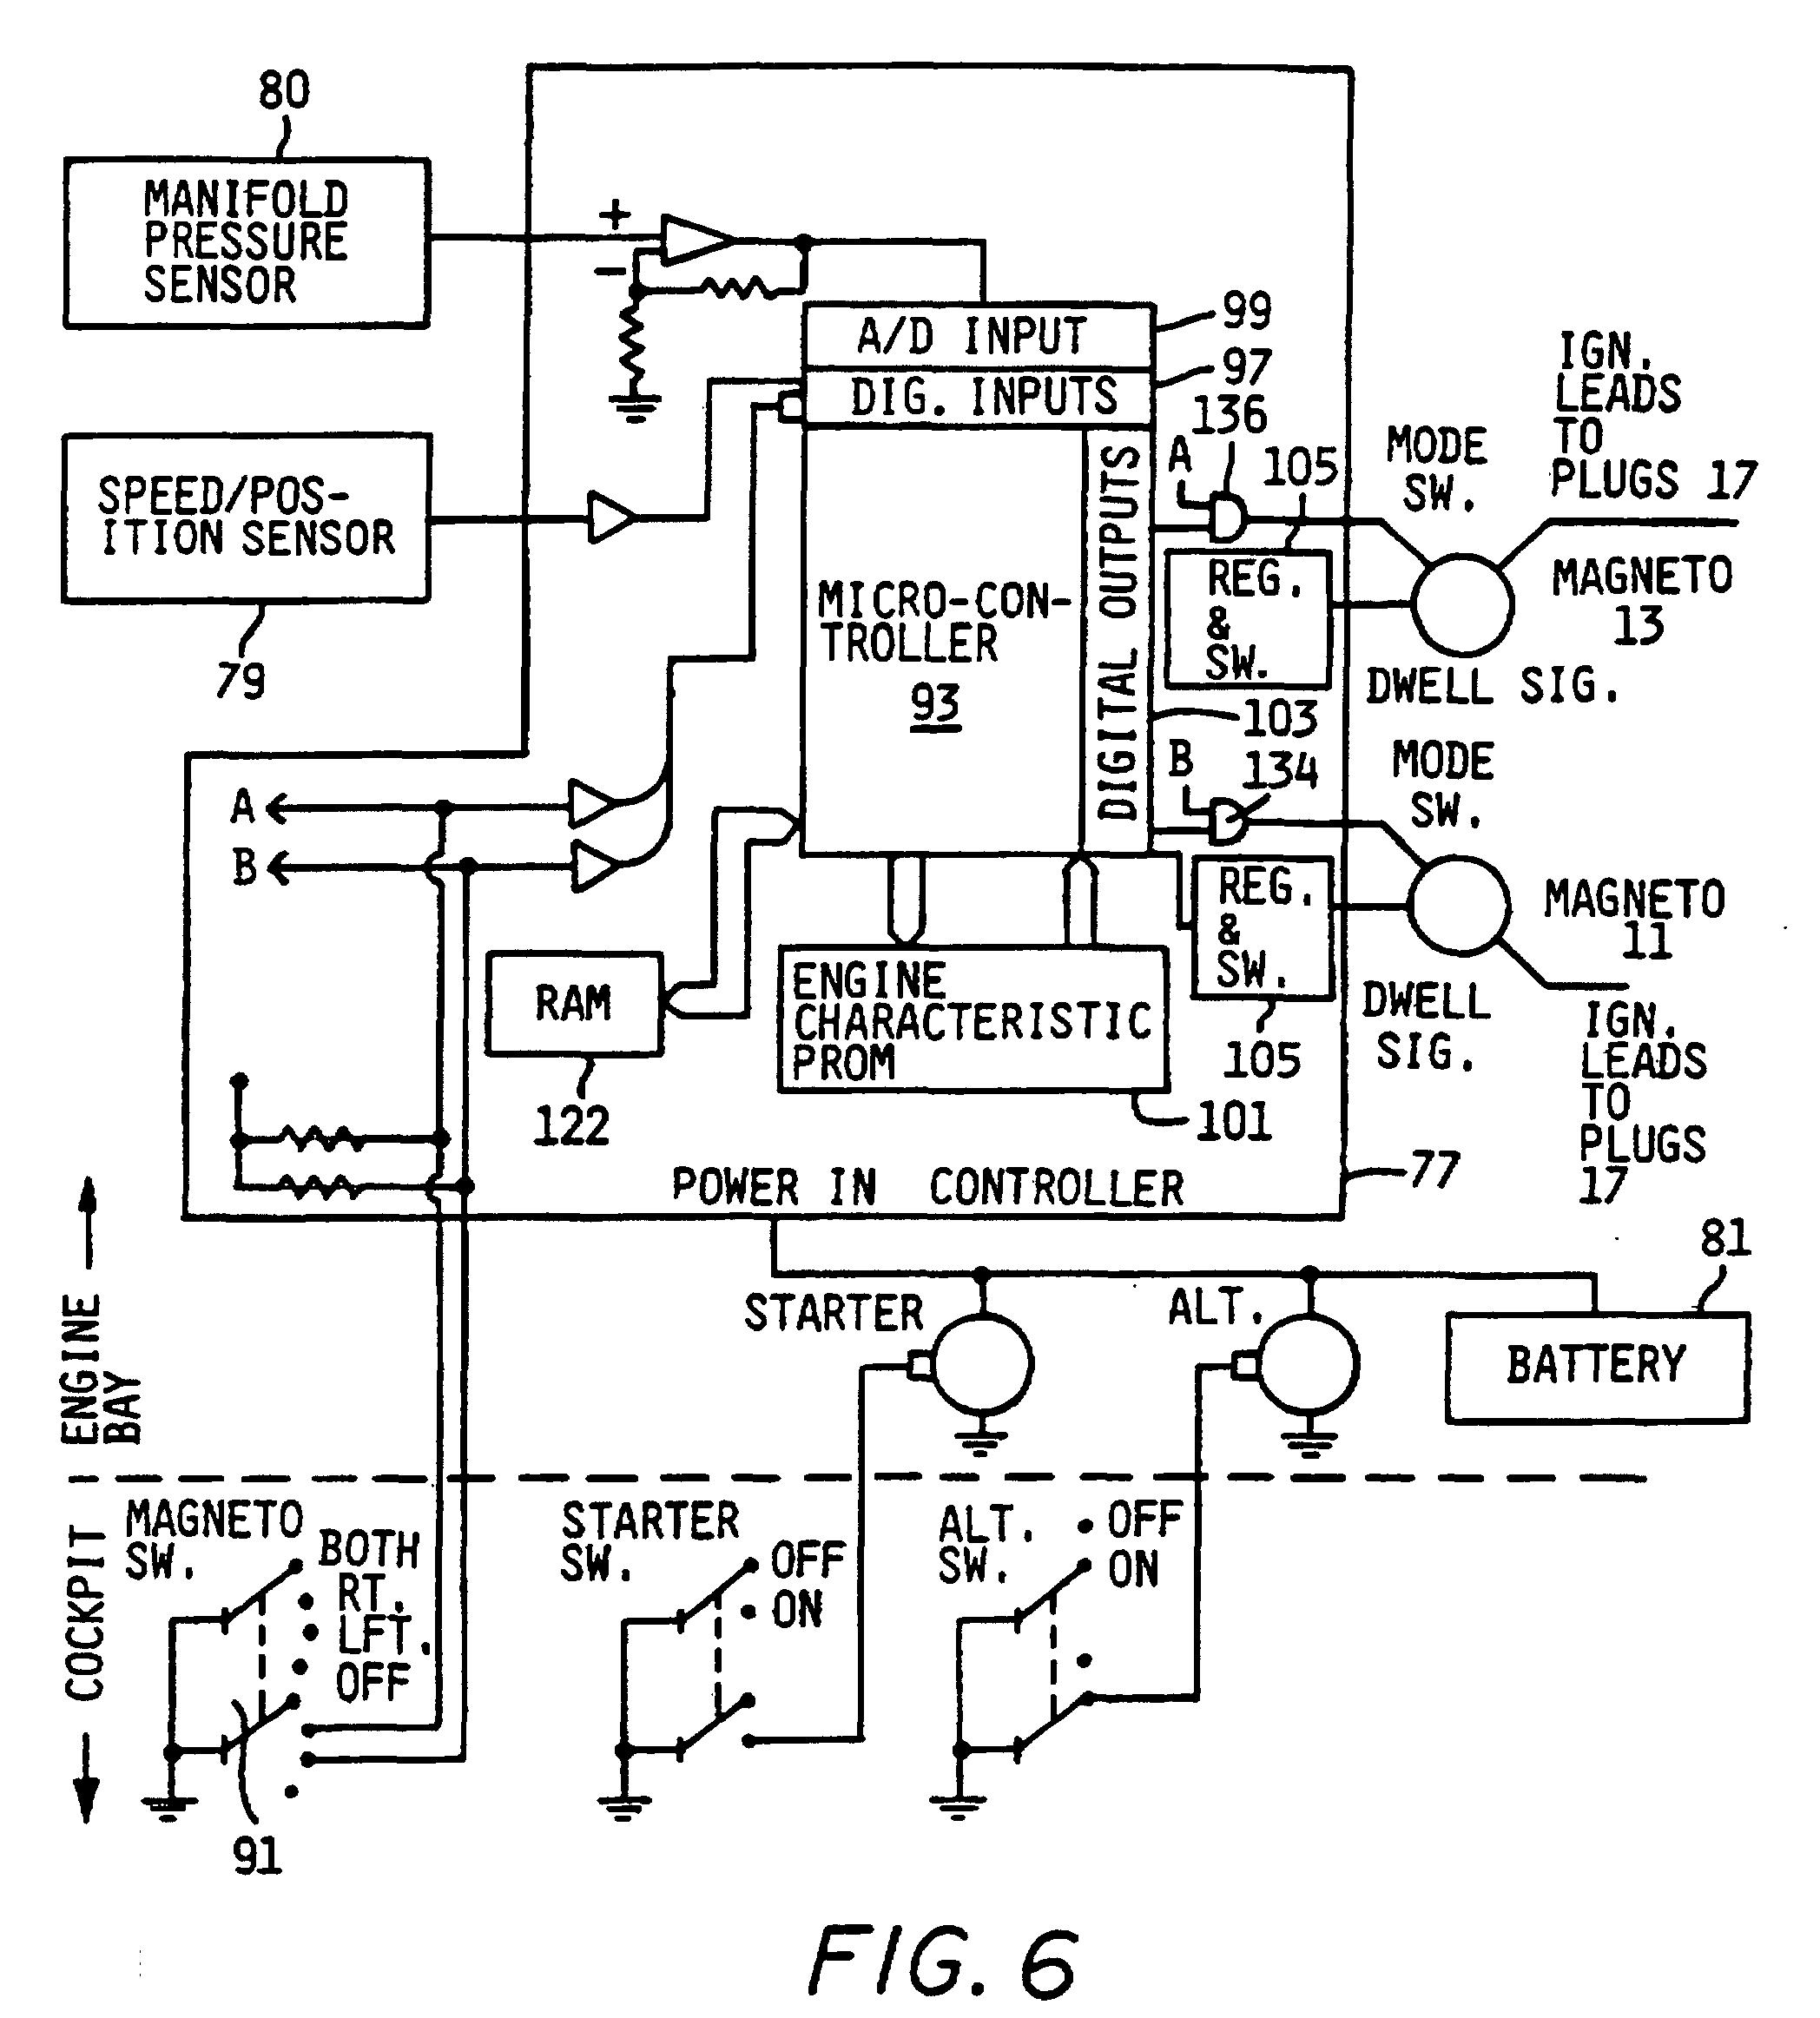 magneto wiring diagram 94 dodge dakota stereo aircraft mag o ignition system